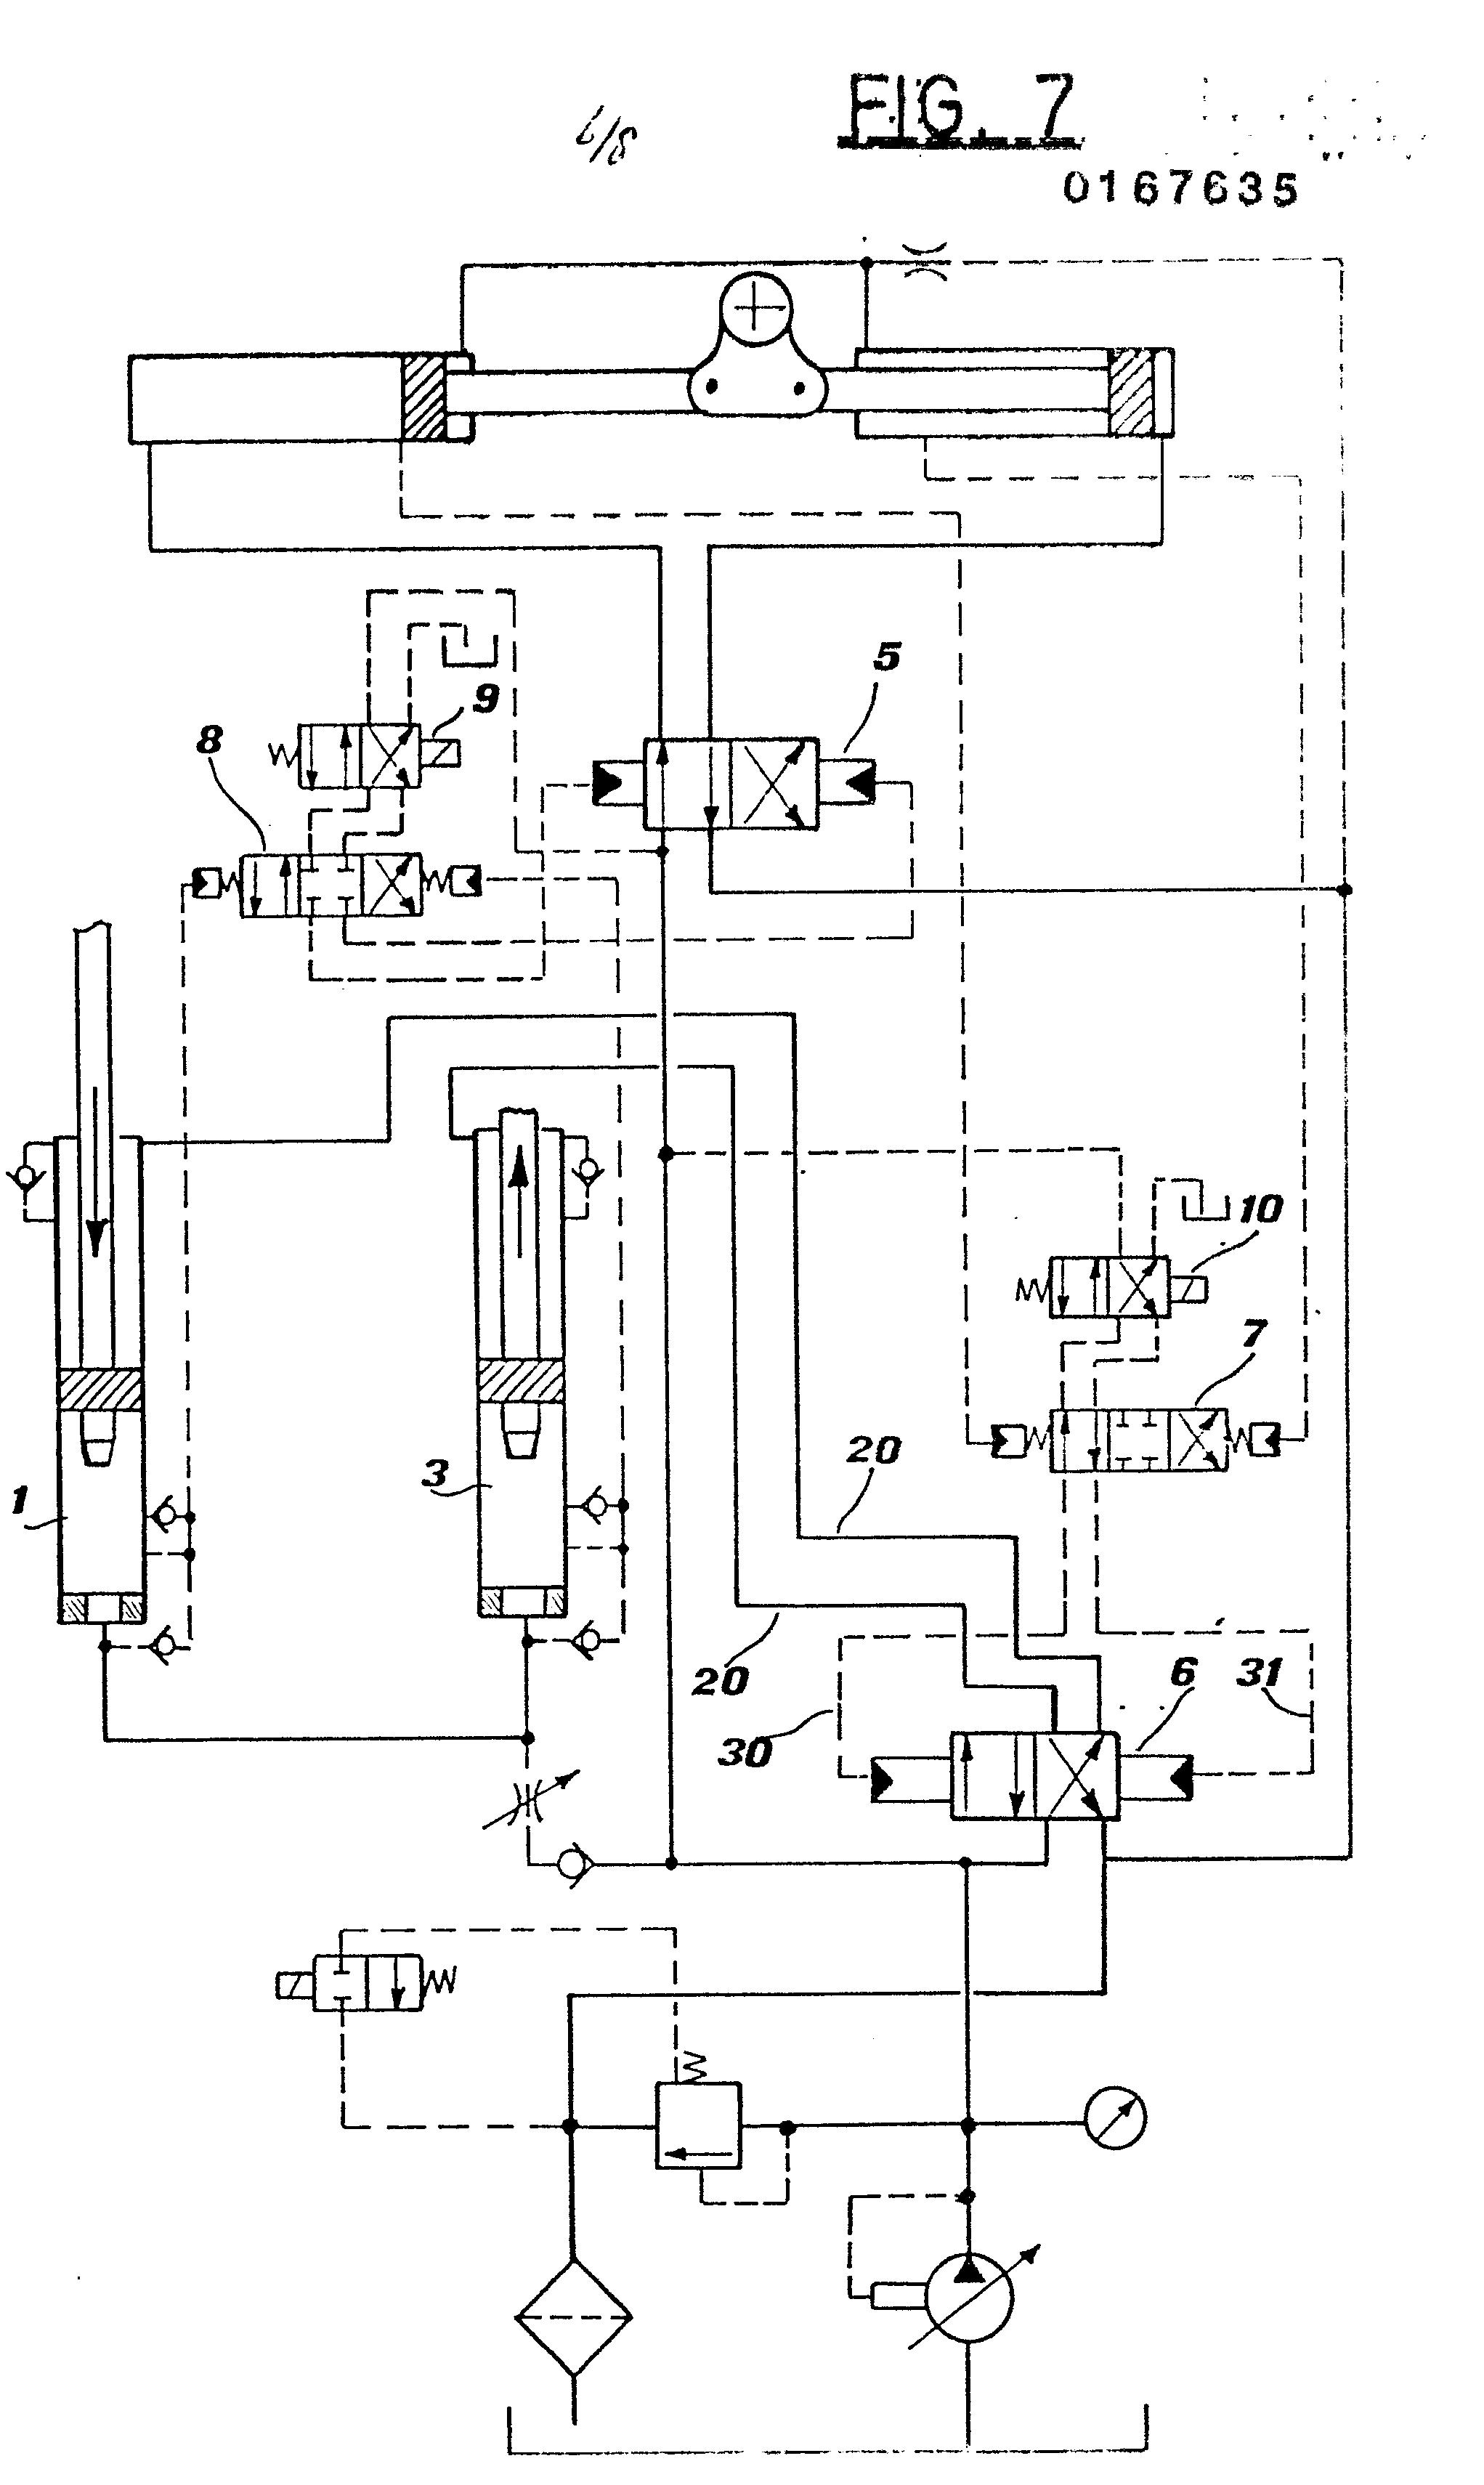 patent ep0167635a1